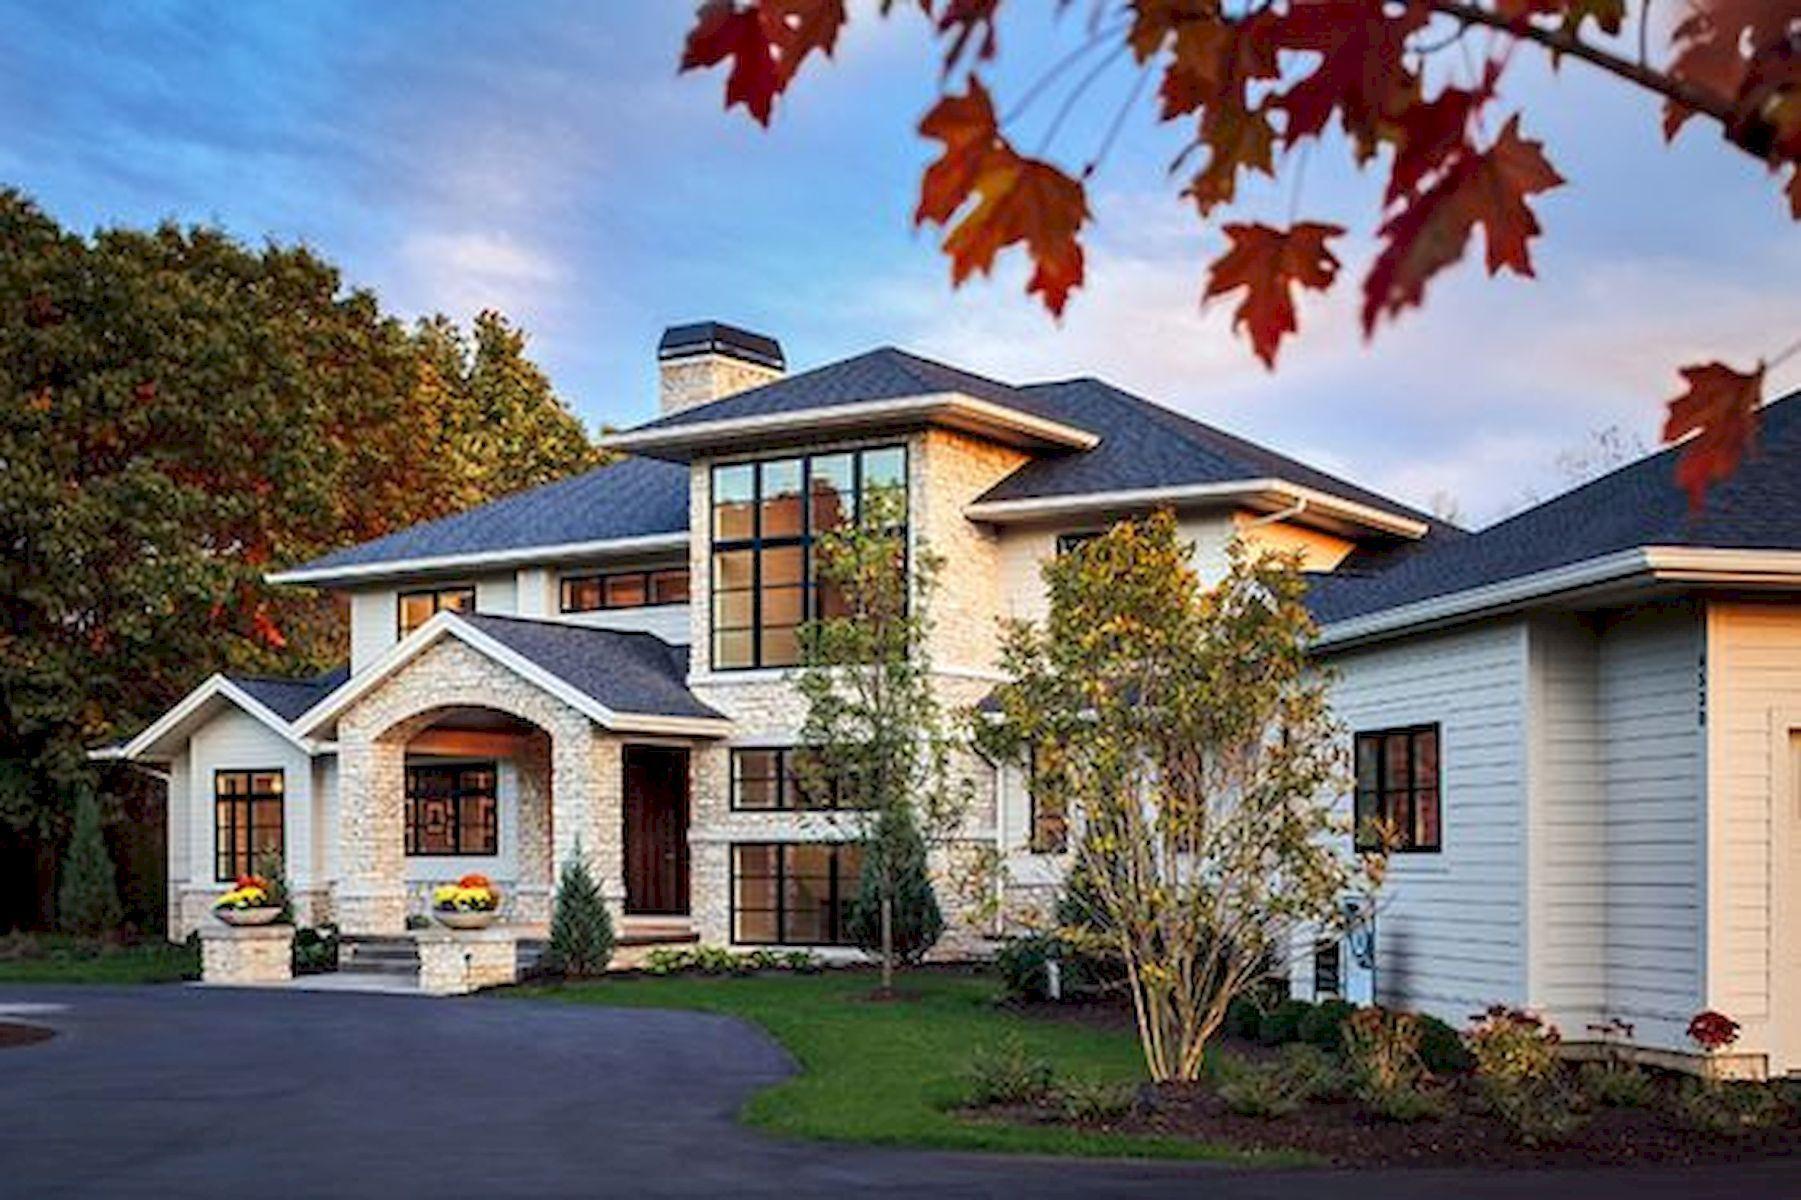 65 stunning modern dream house exterior design ideas 30 on most popular modern dream house exterior design ideas the best destination id=58817